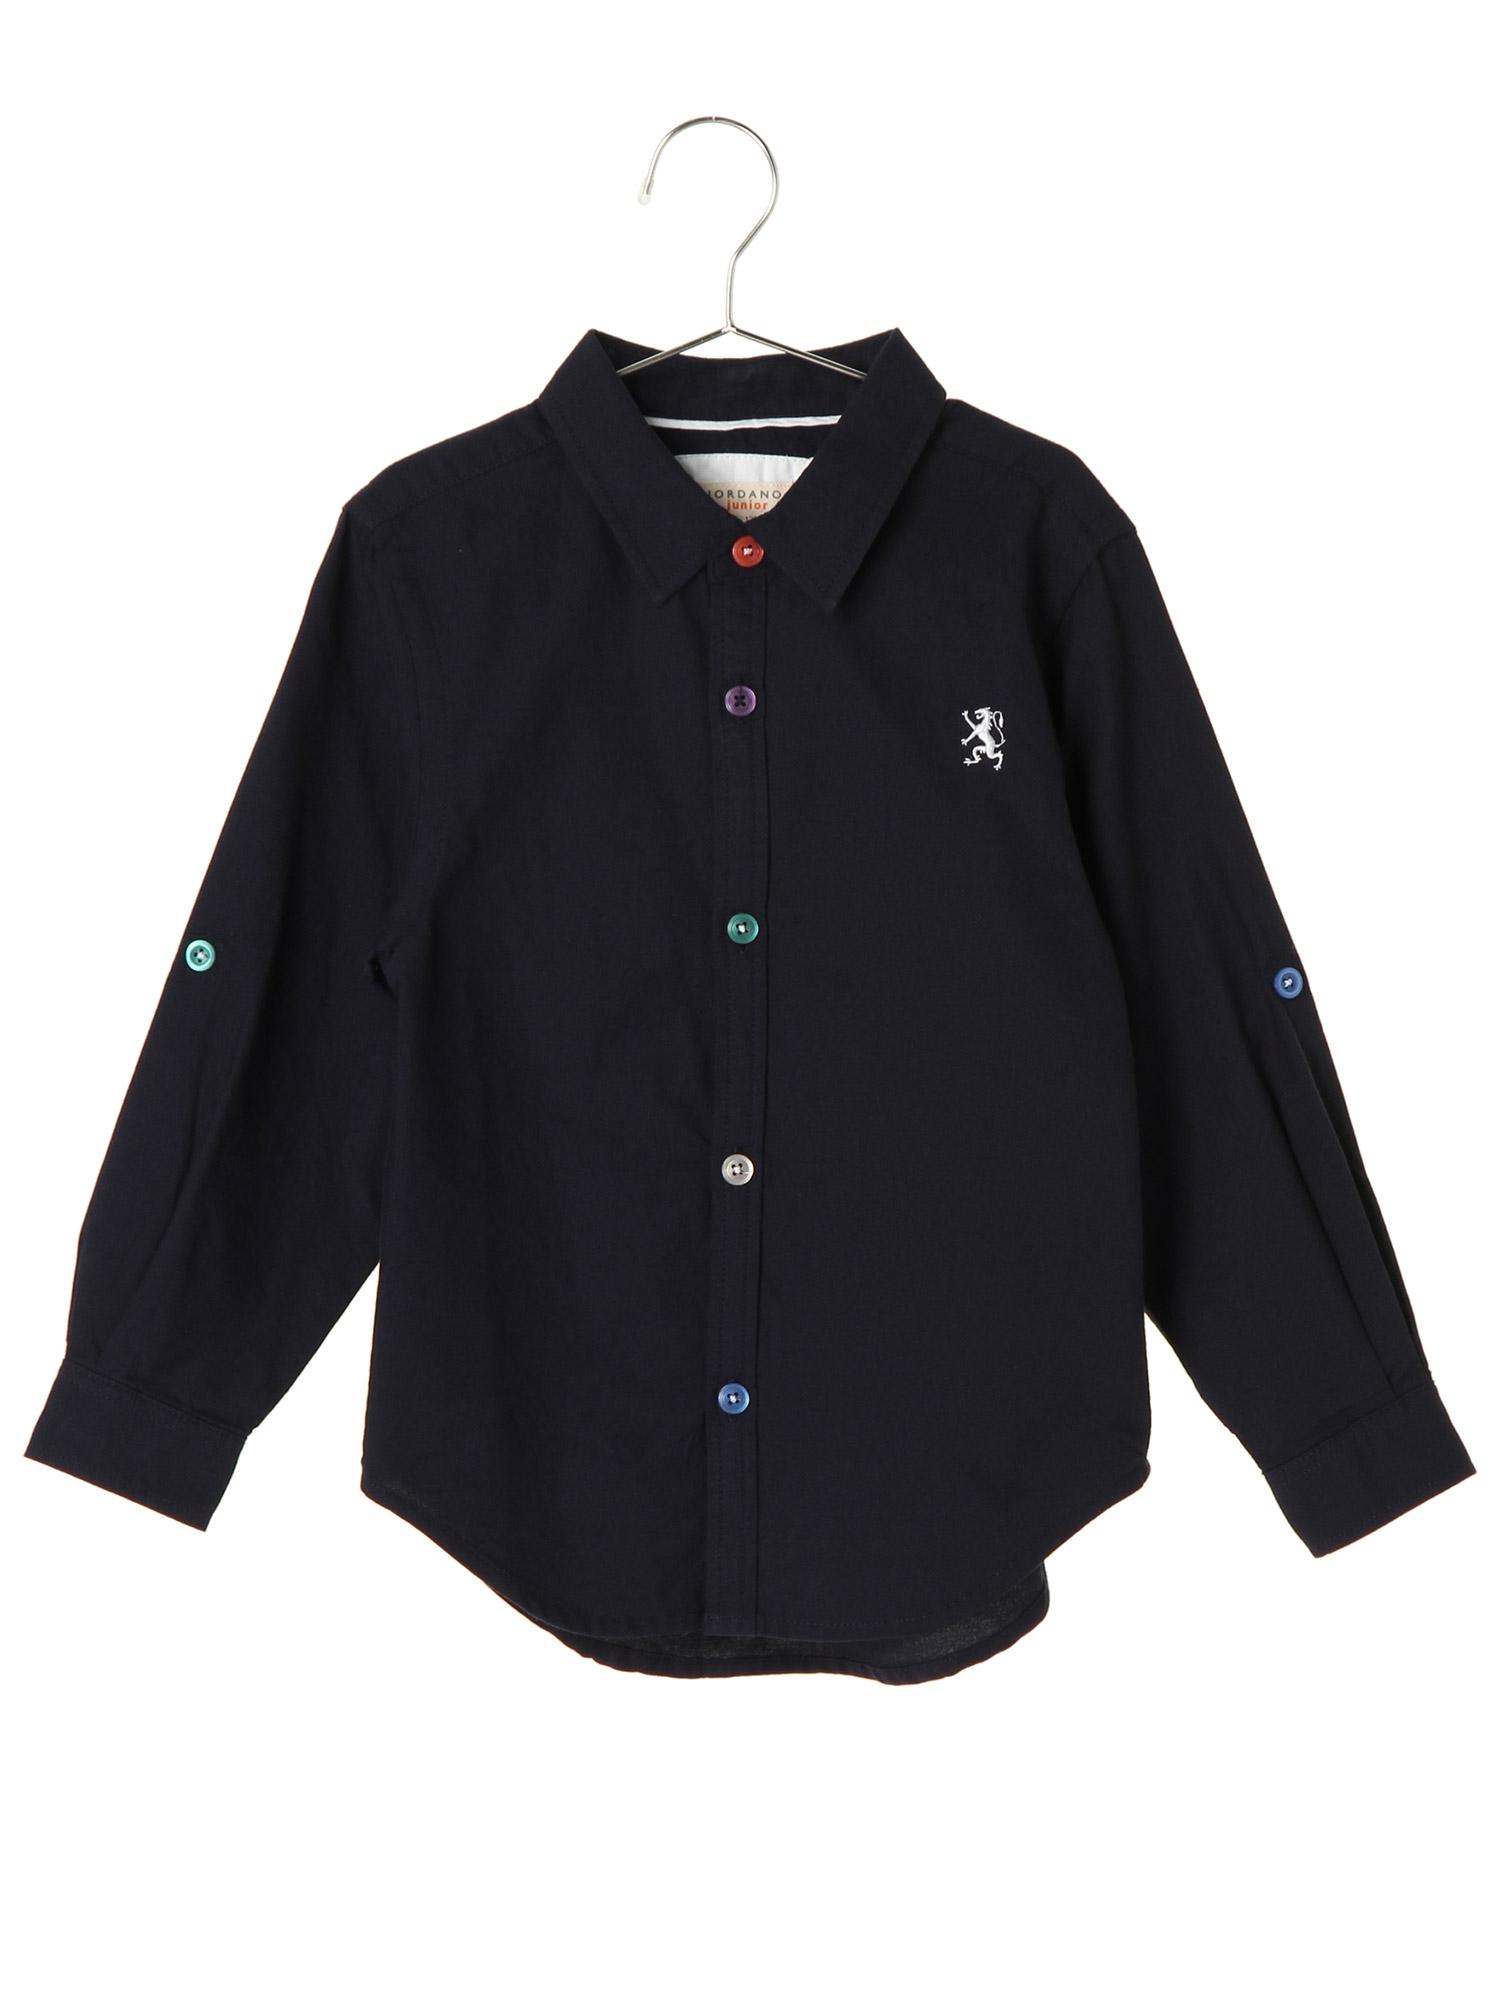 [GIORDANO]ライオン刺繍オックスフォード長袖シャツ